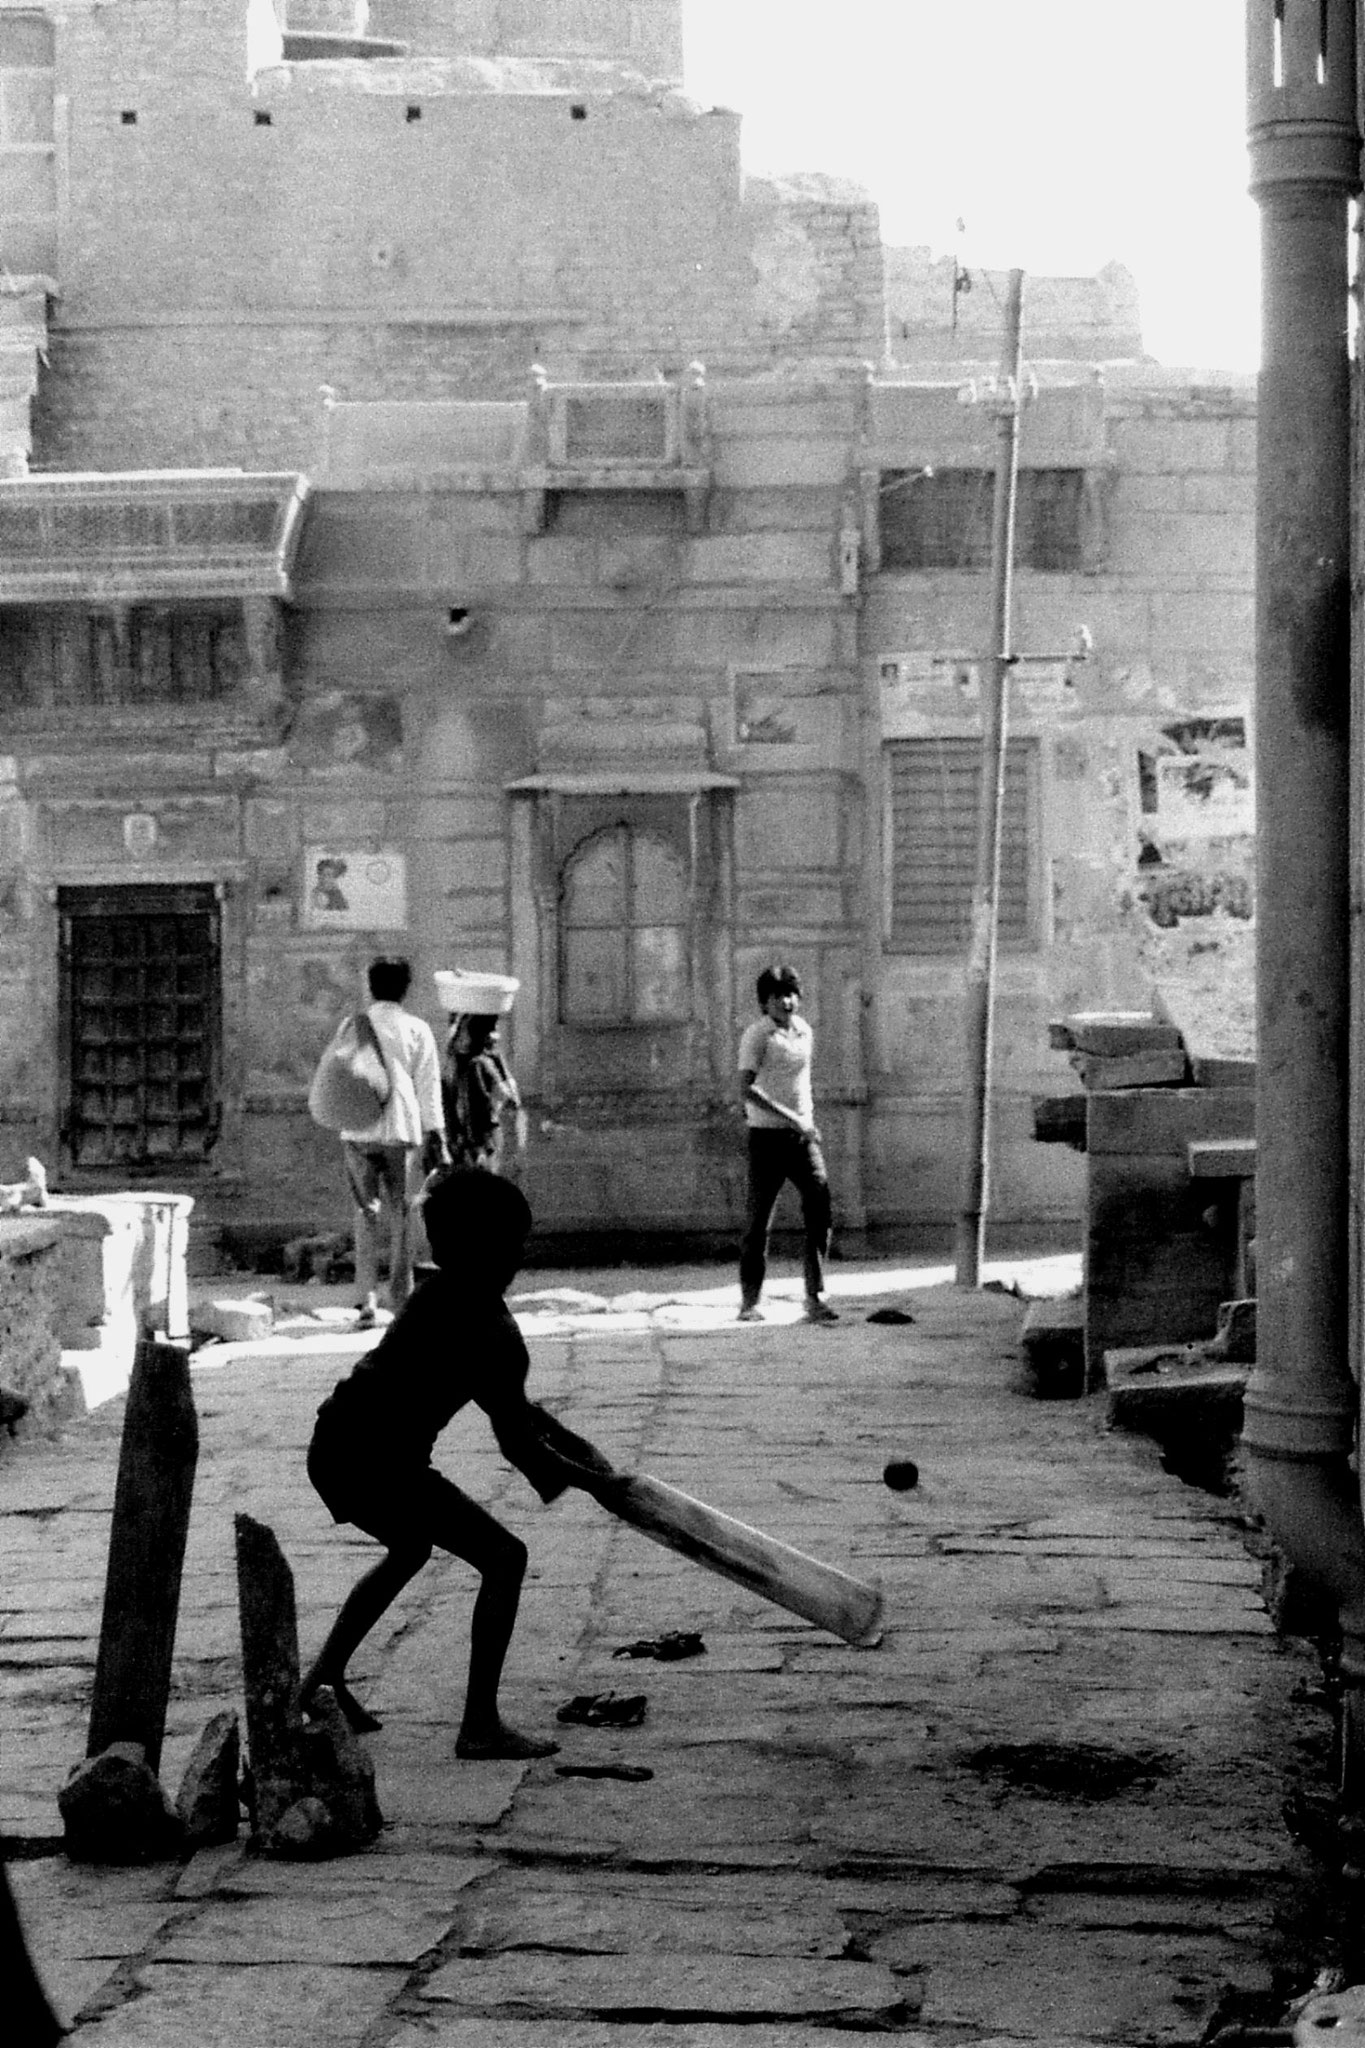 3/12/1989: 24: Jaisalmer, cricket